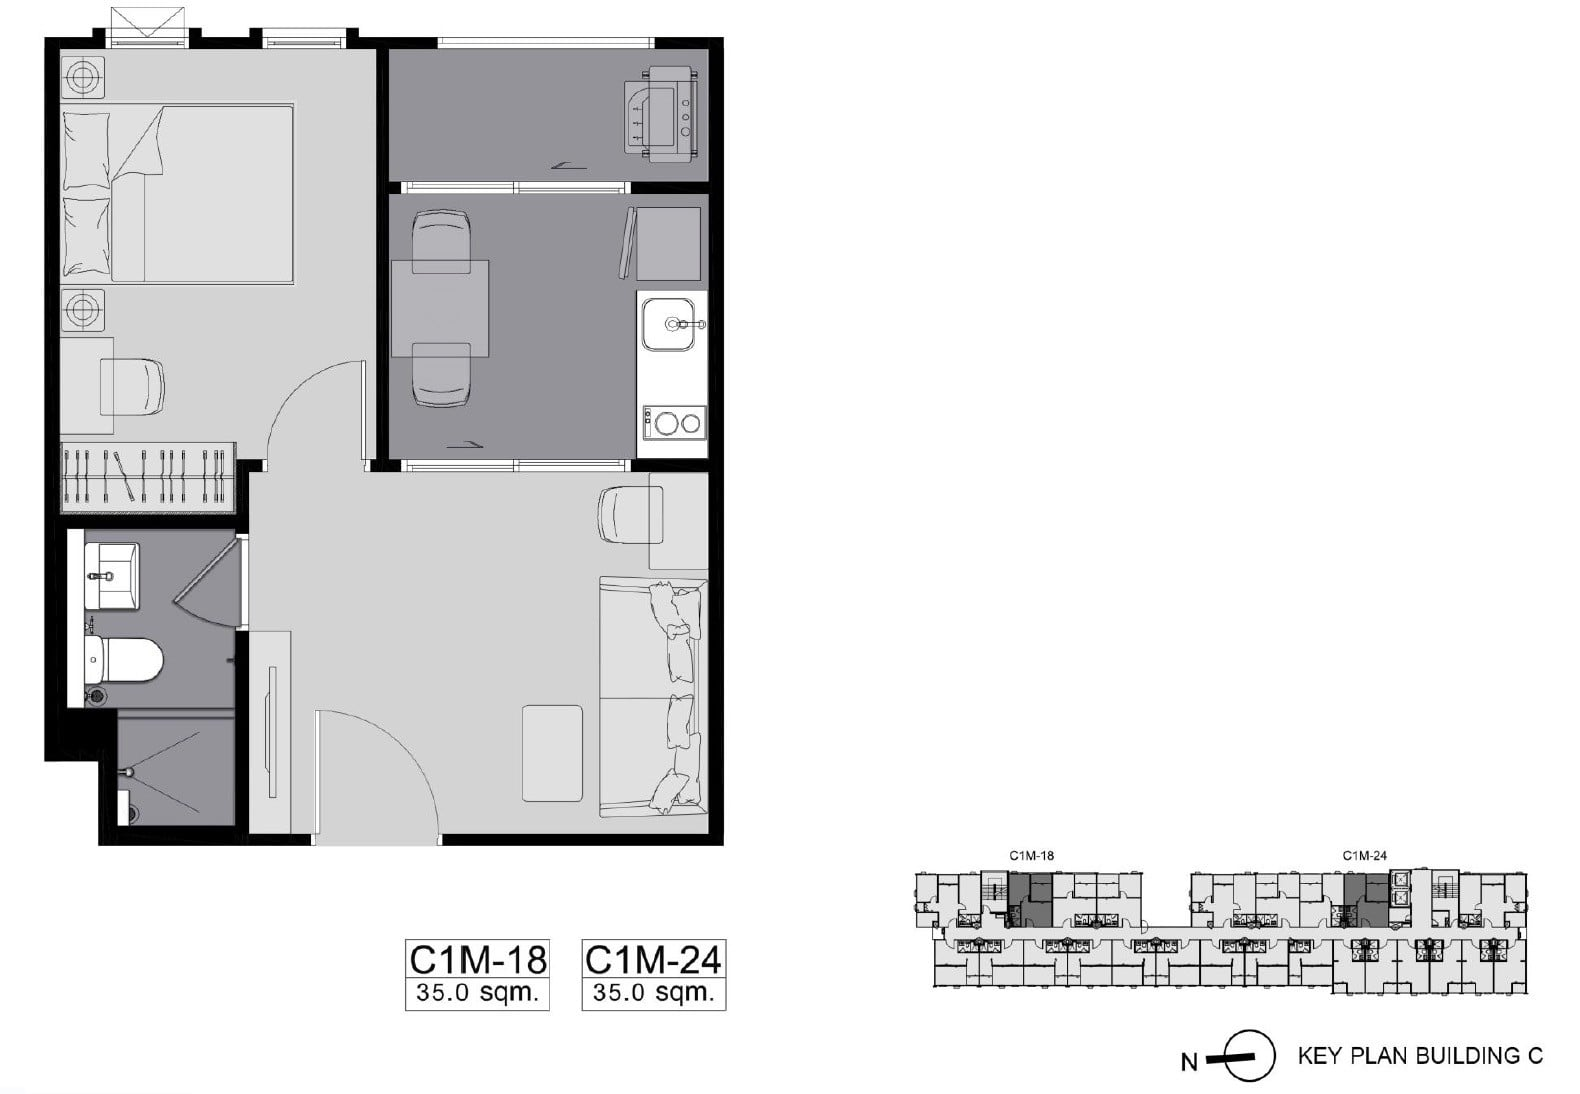 Aspire-Asoke-ratchada-1Bedroom C1M